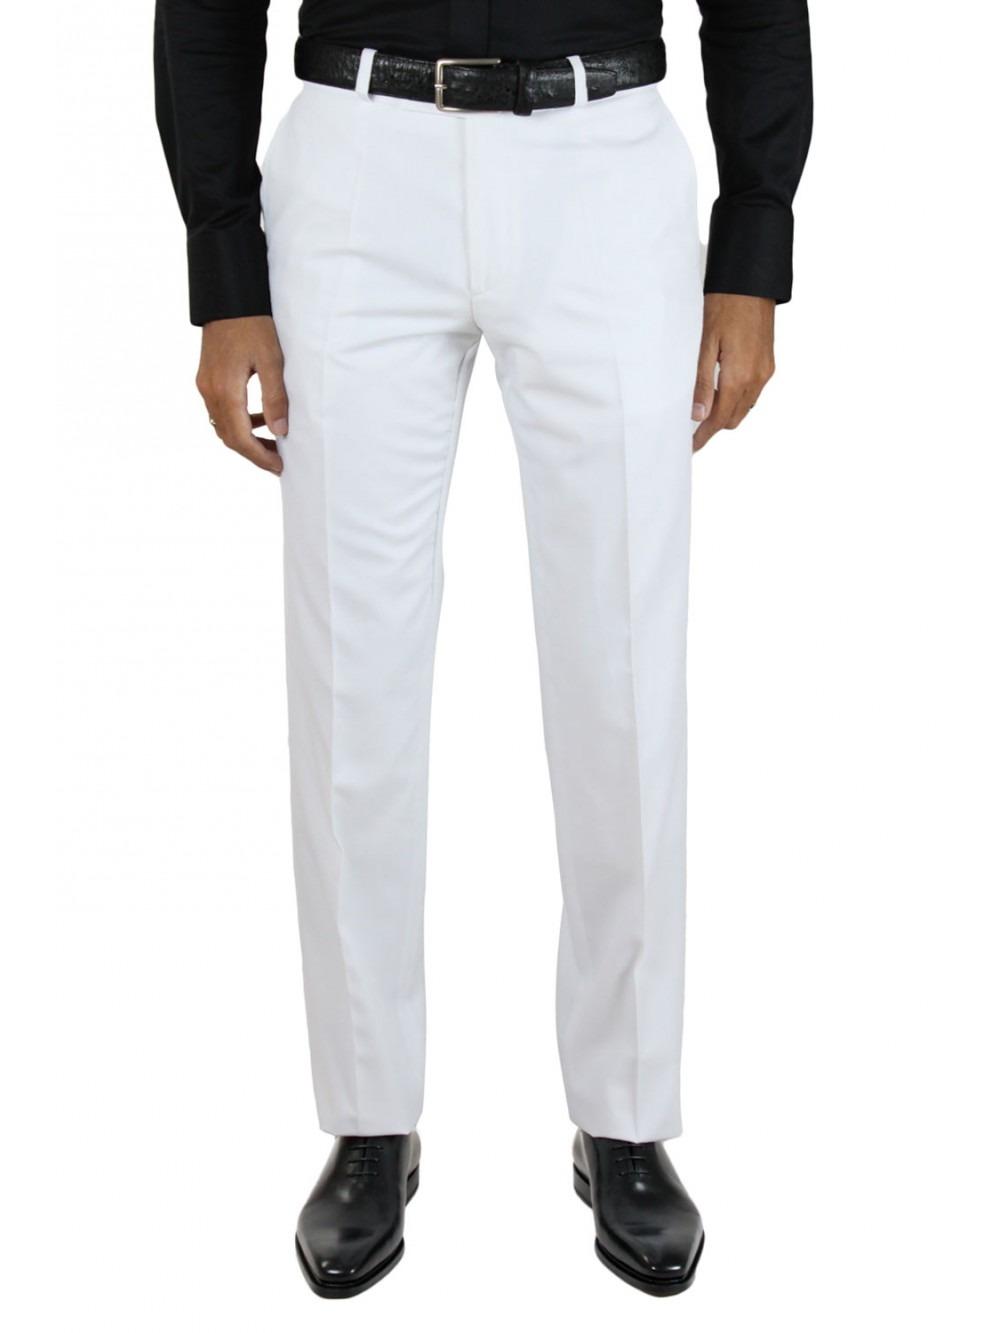 pantalon blanc chic homme. Black Bedroom Furniture Sets. Home Design Ideas